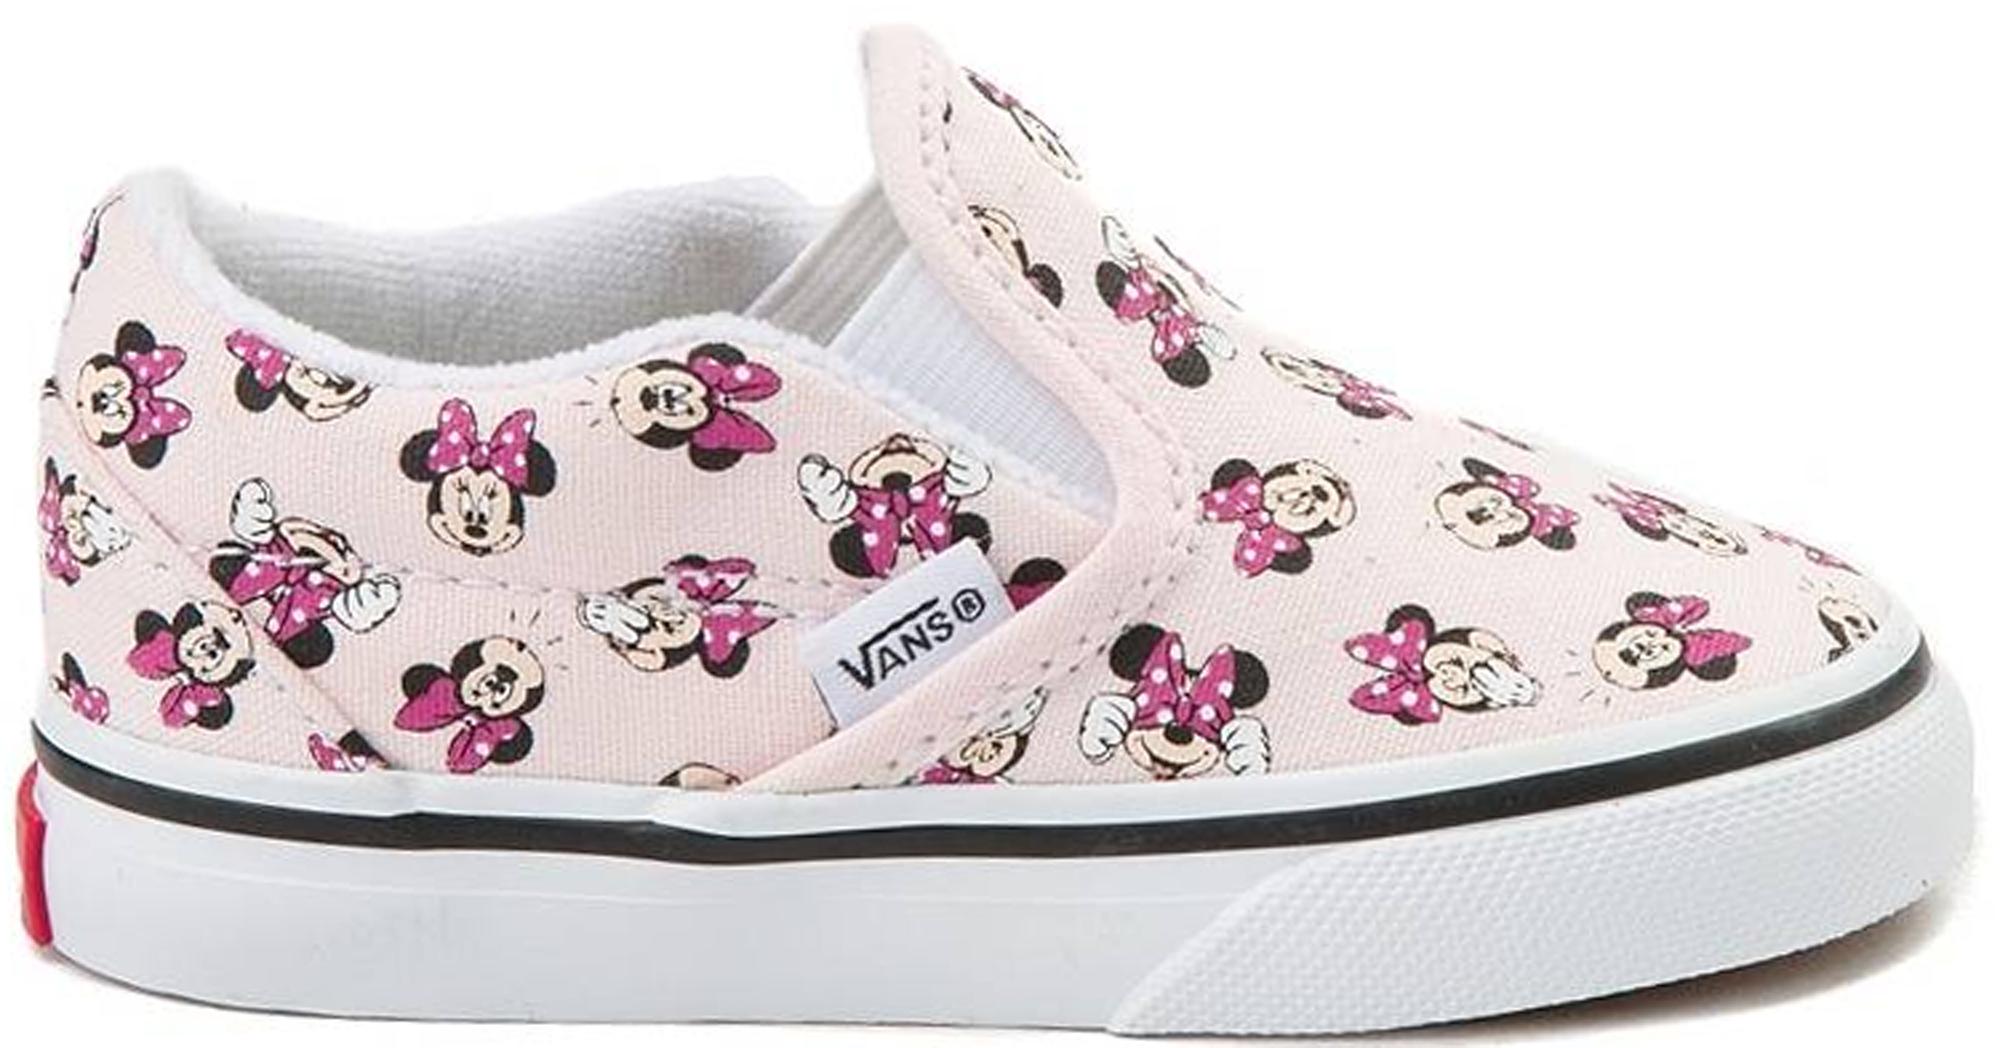 Vans Slip-On Disney Minnie Mouse (TD